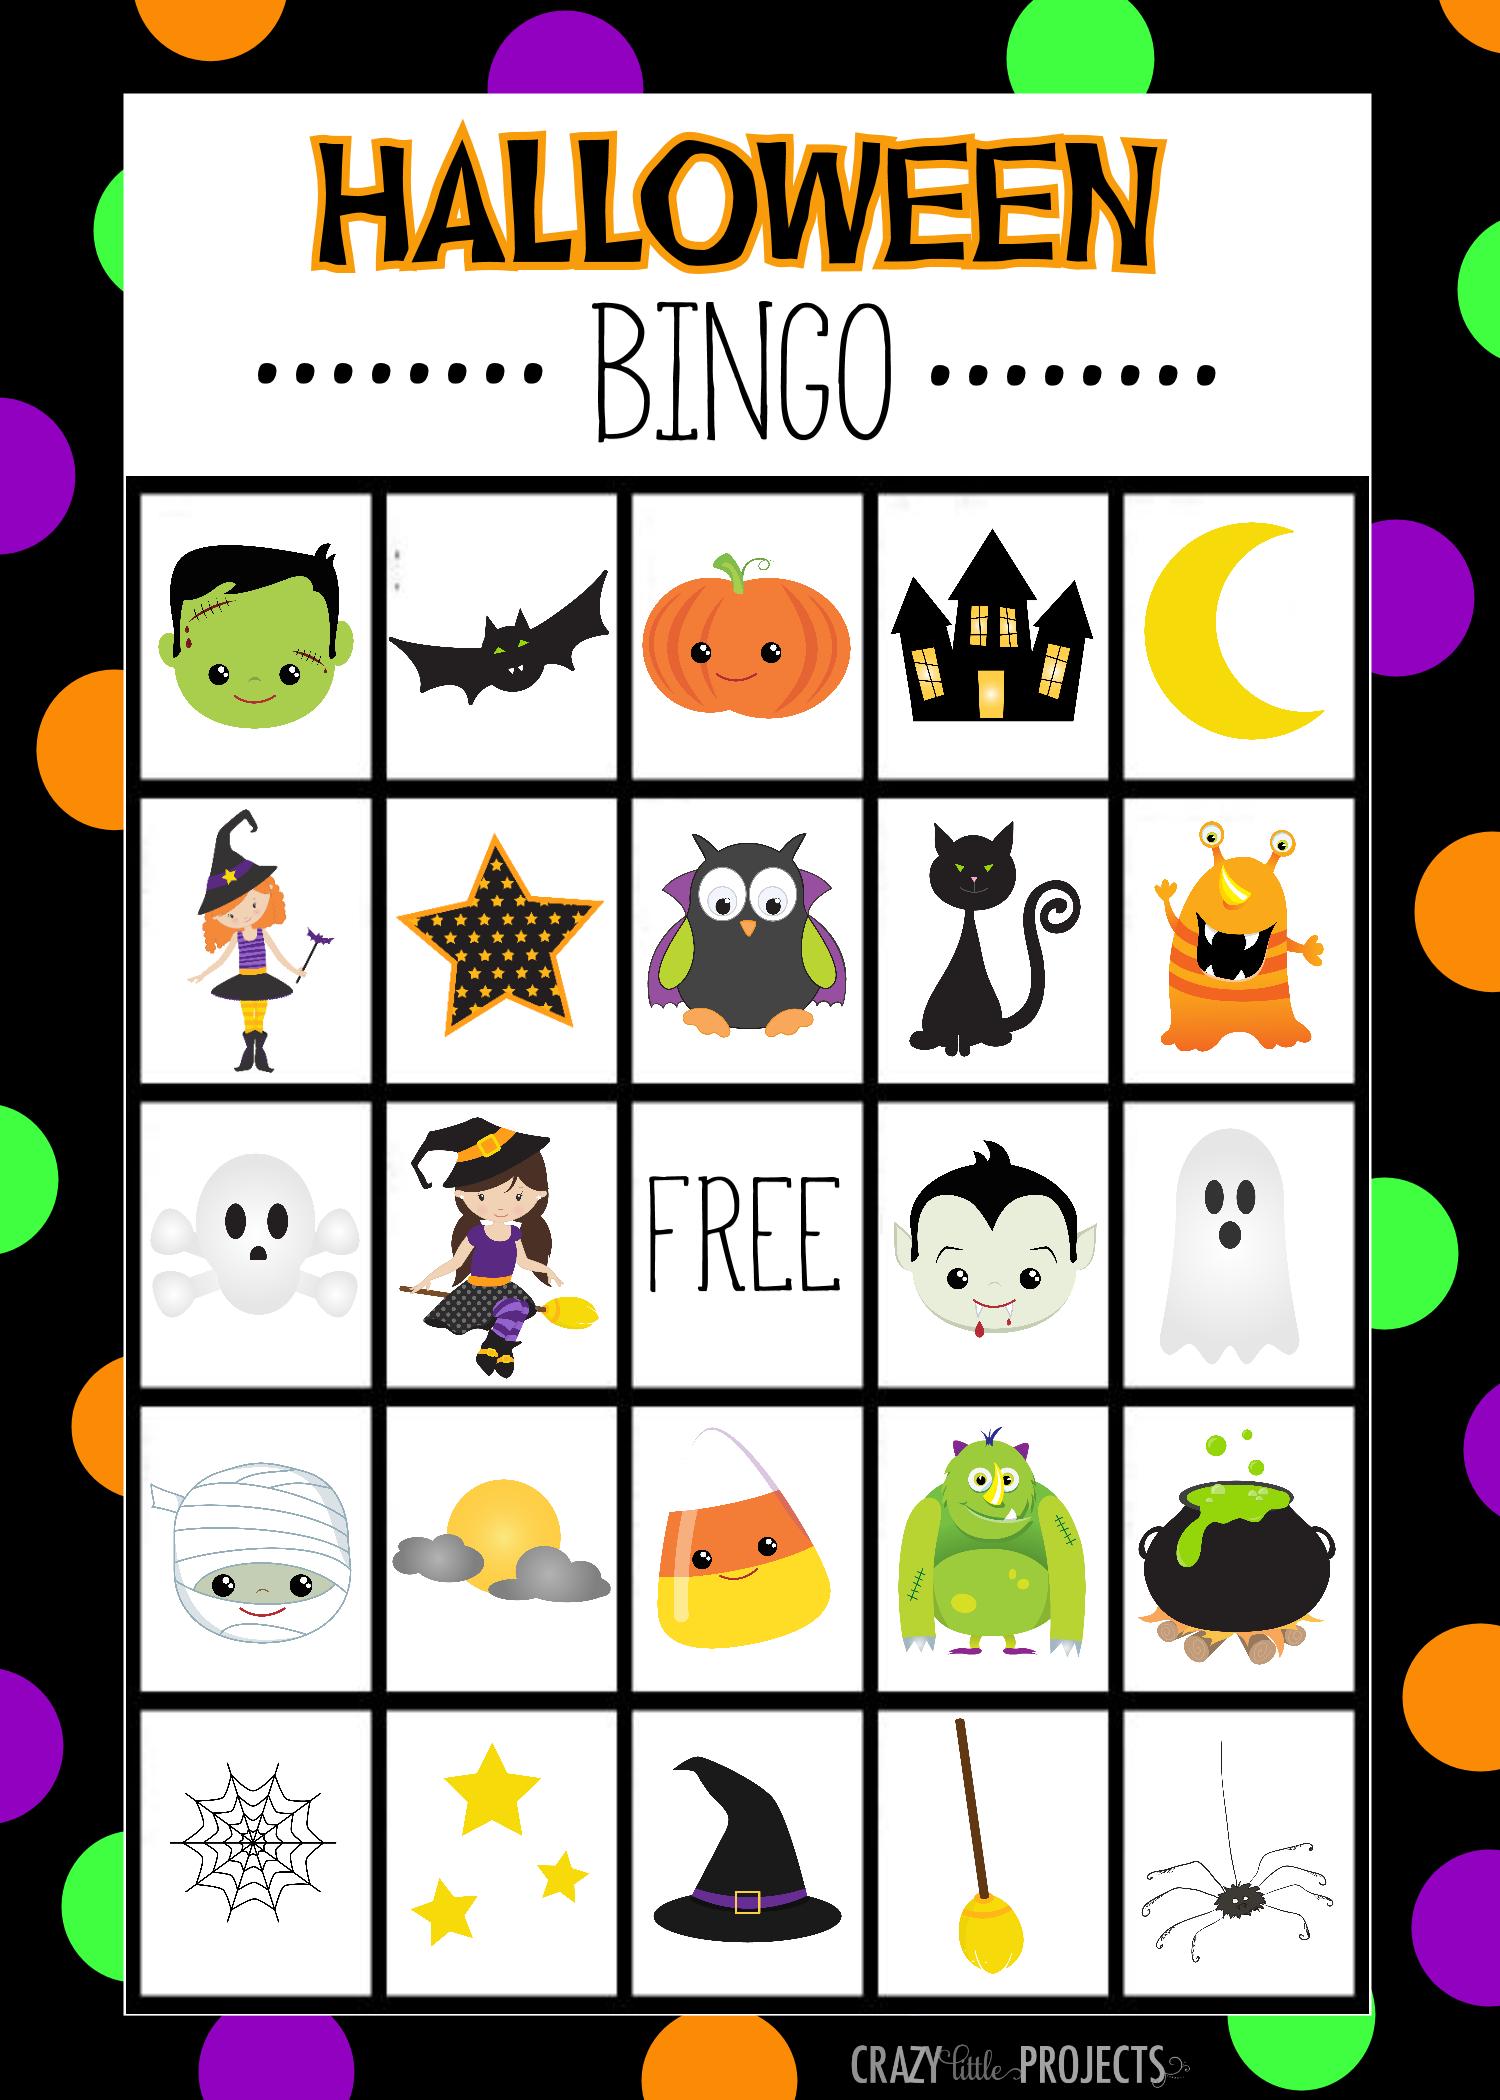 Halloween Bingo - Cute Free Printable Game | Halloween Bingo